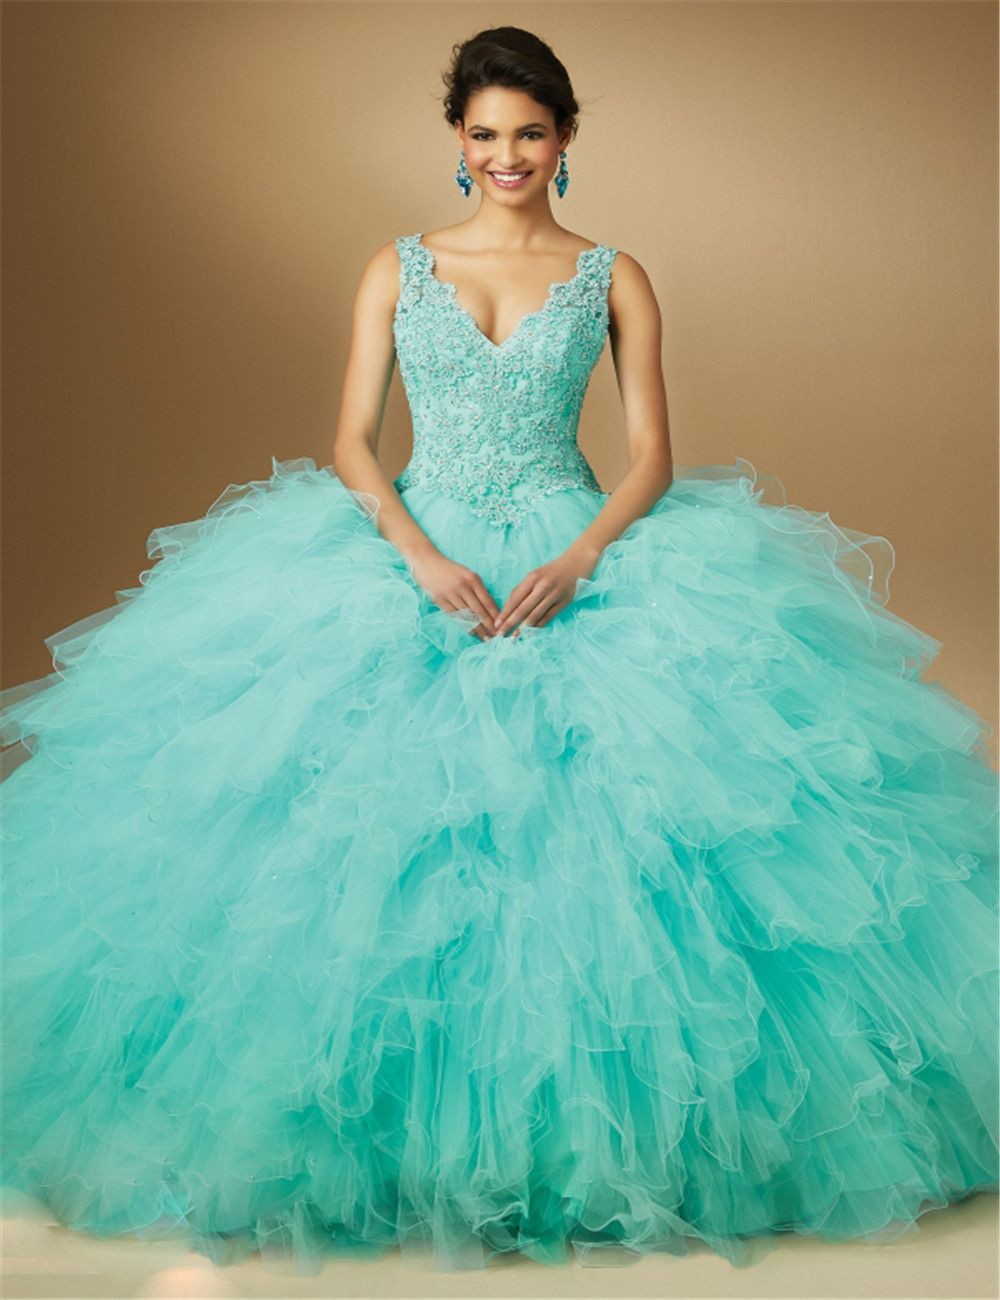 Turquoise Quinceanera Dress Glitz Beading Custom Made Vestidos de 15 ...